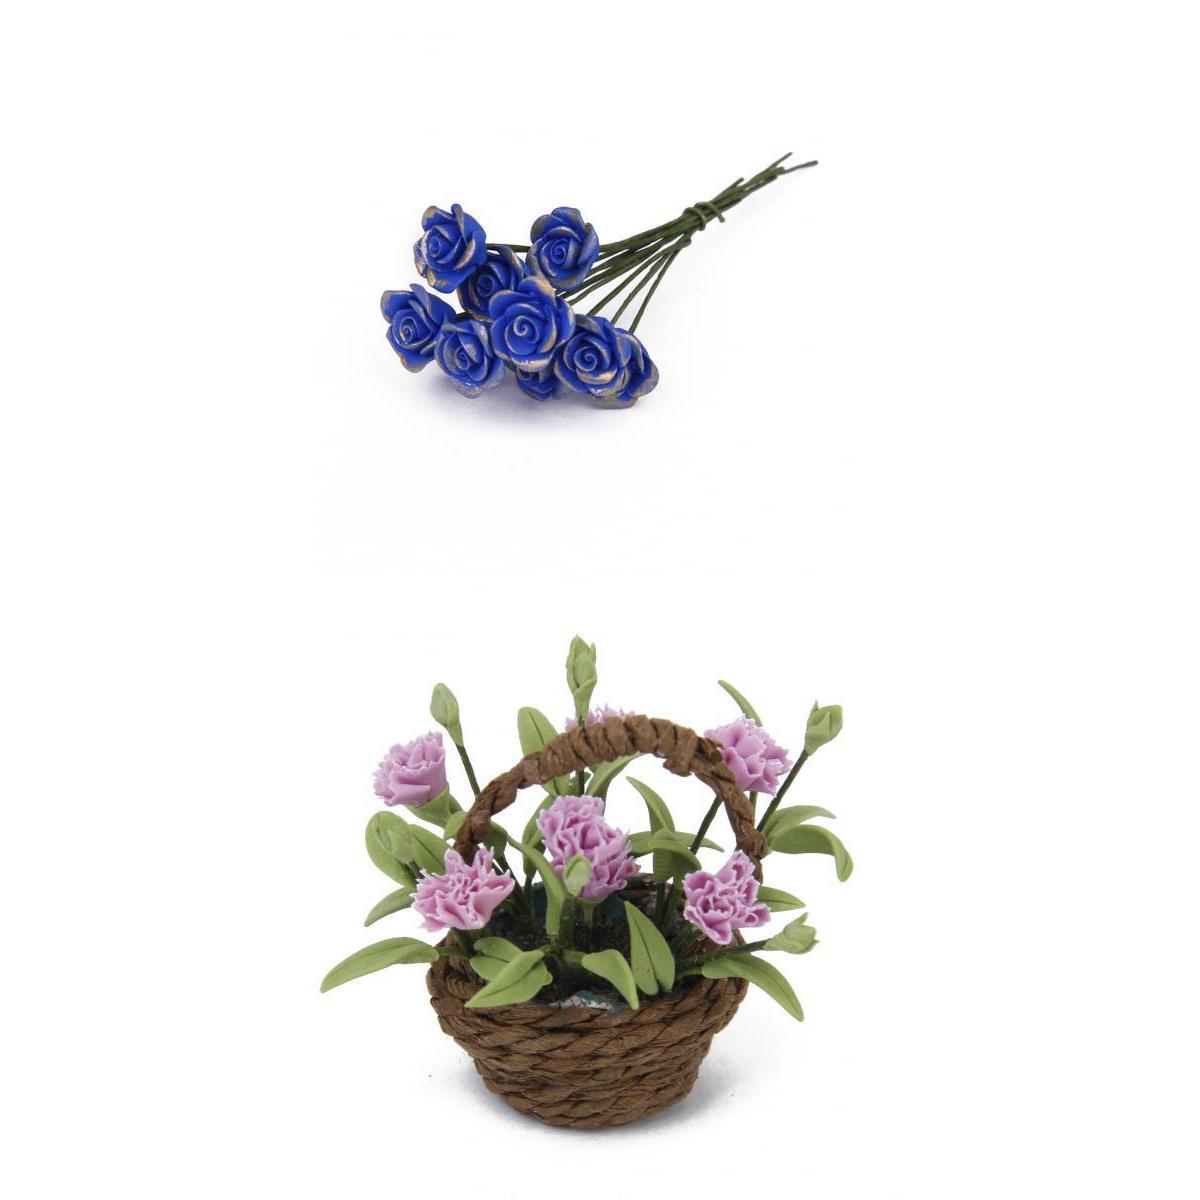 10pcs Artificial Bule Rose Clay for Dollhouse+Carnation Flower Plant w/Basket